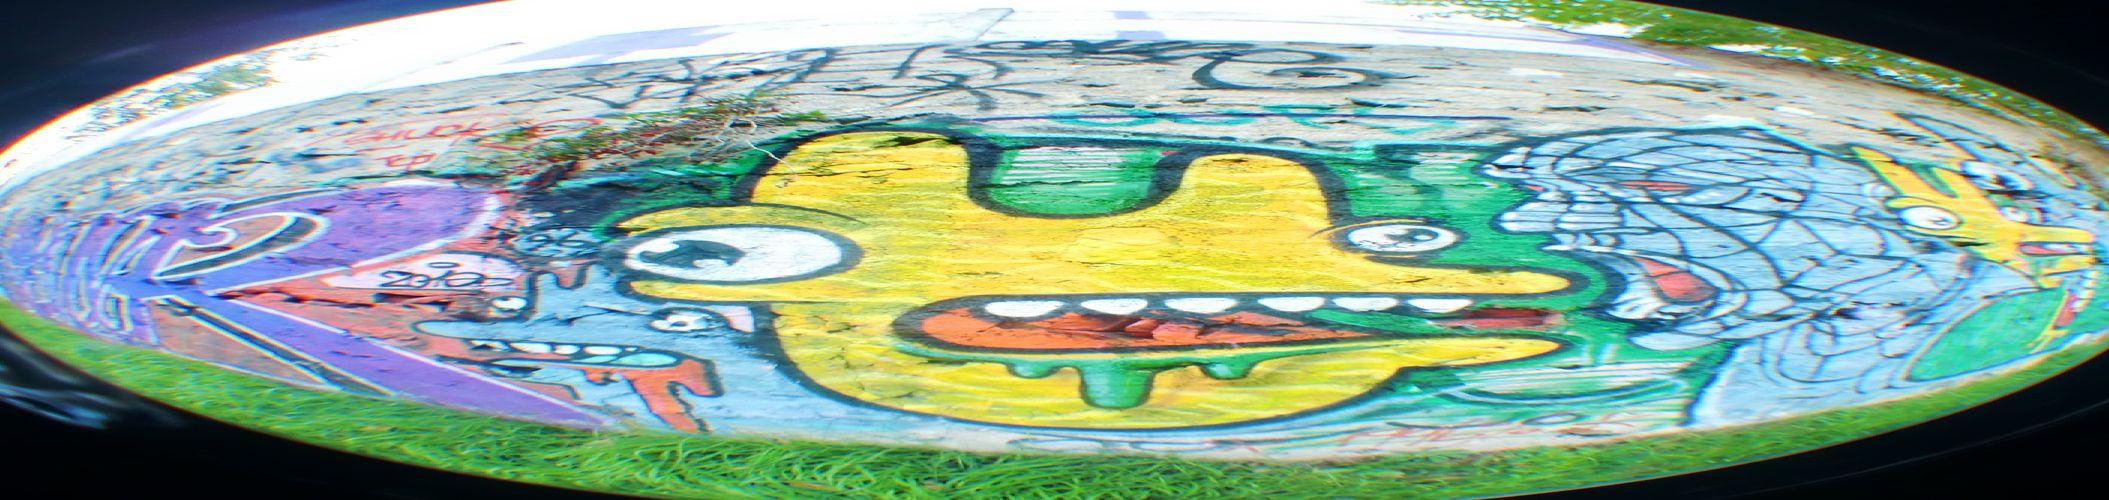 personnages par yak bagnolet france street art et